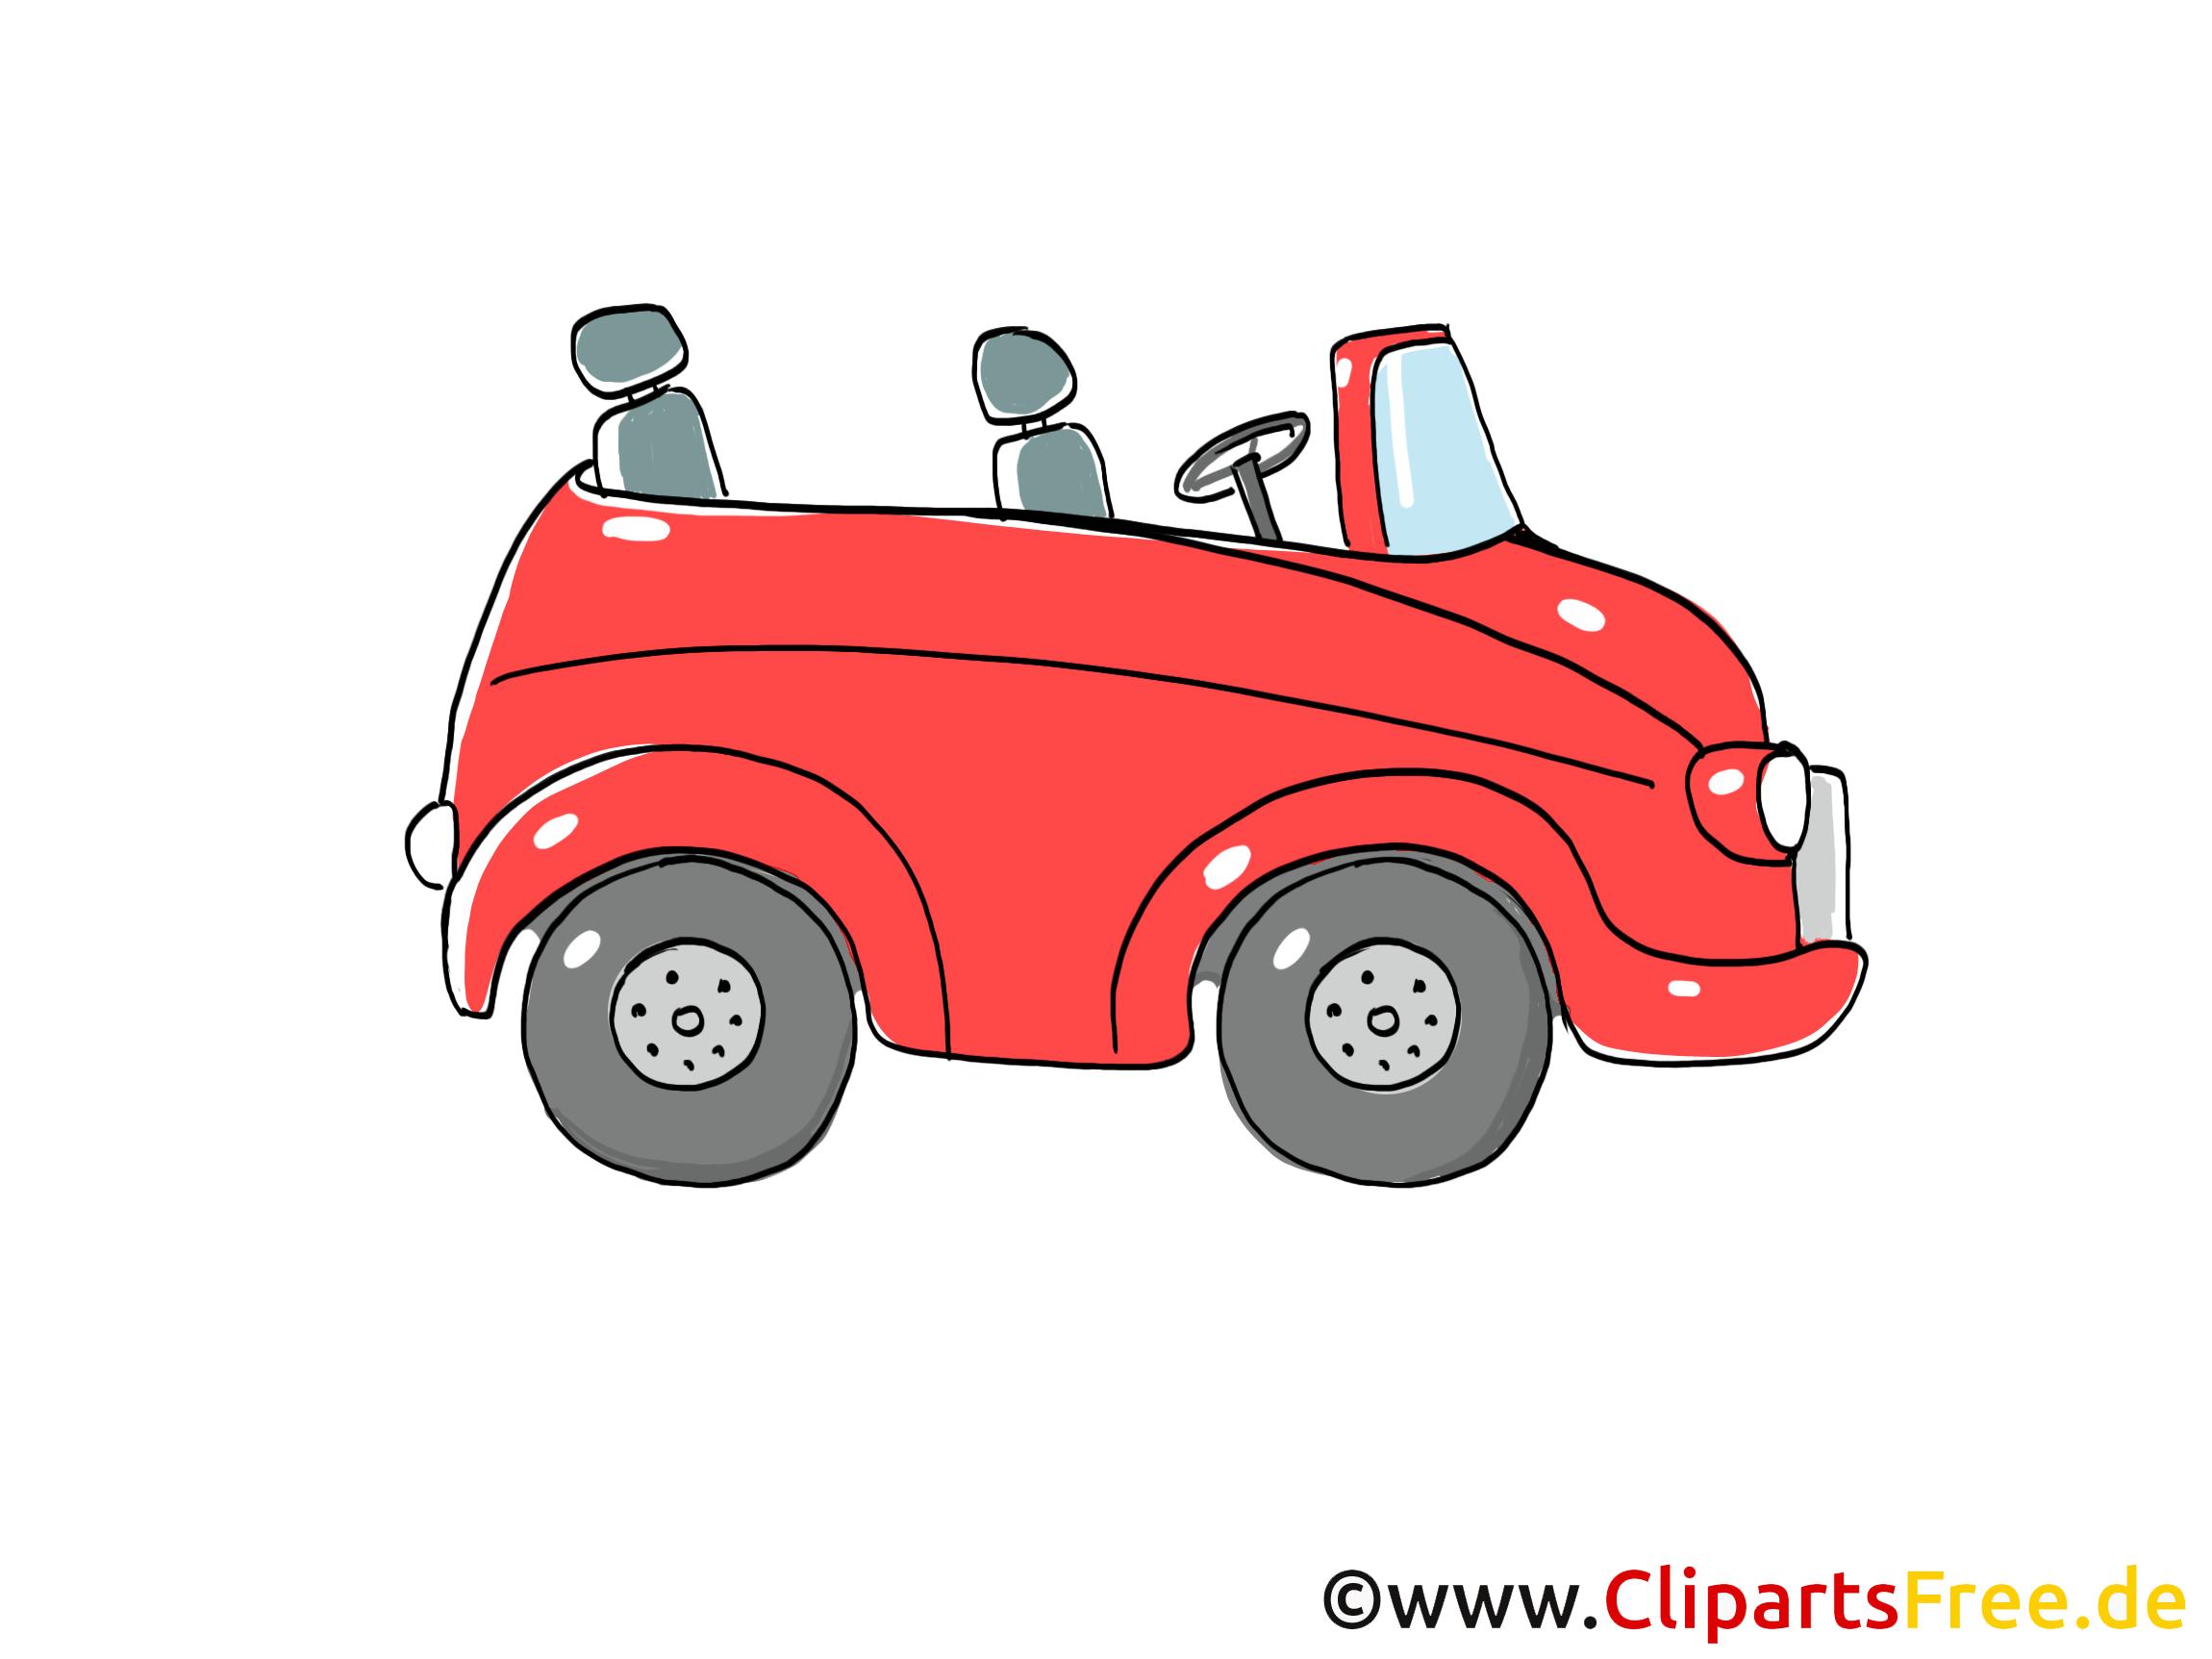 Kabrio Clipart, Bild, Cartoon, Comic, Grafik